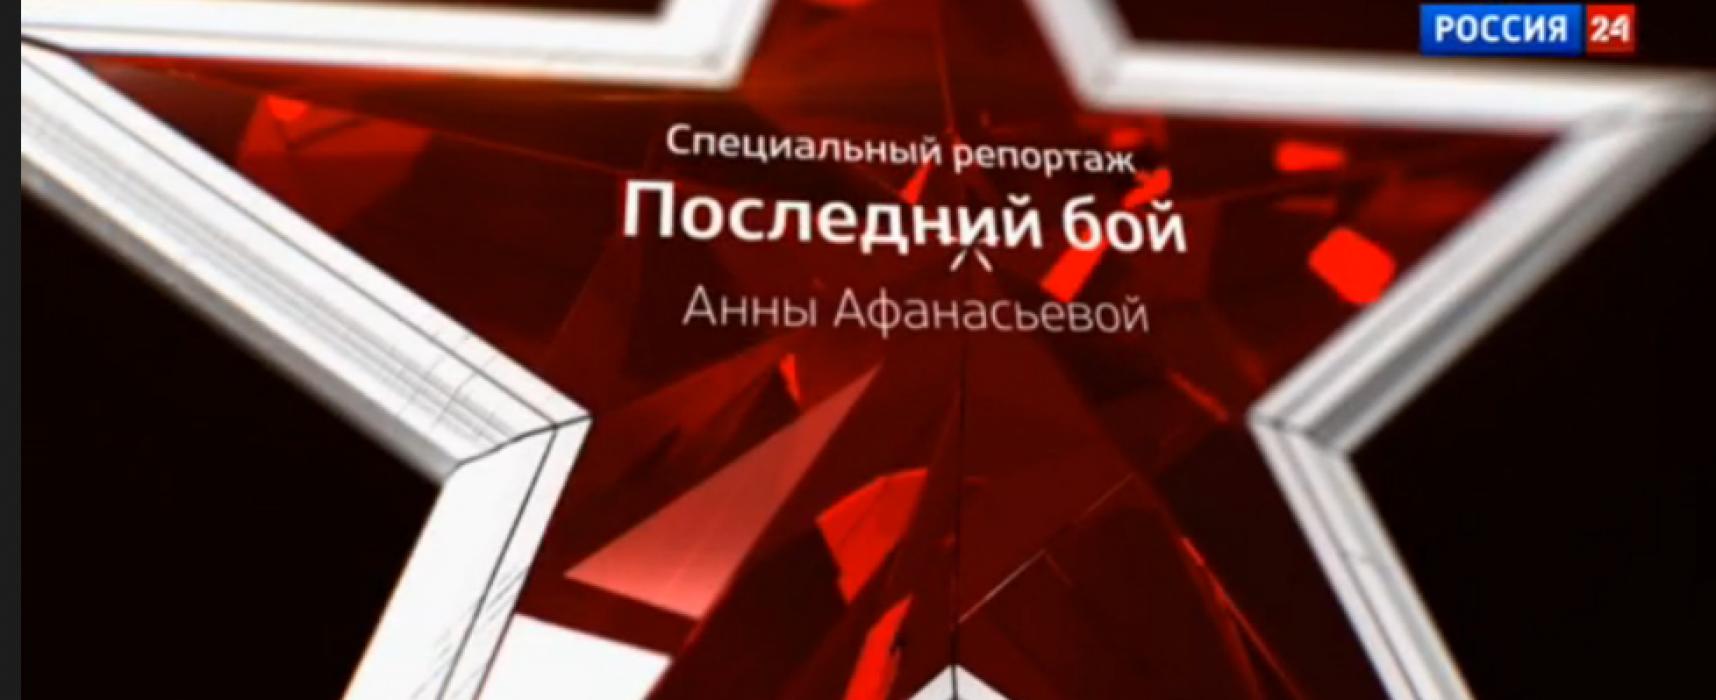 Fake: Ukraine Cancels Victory Day, Plans to Dismantle Vatutin Monument